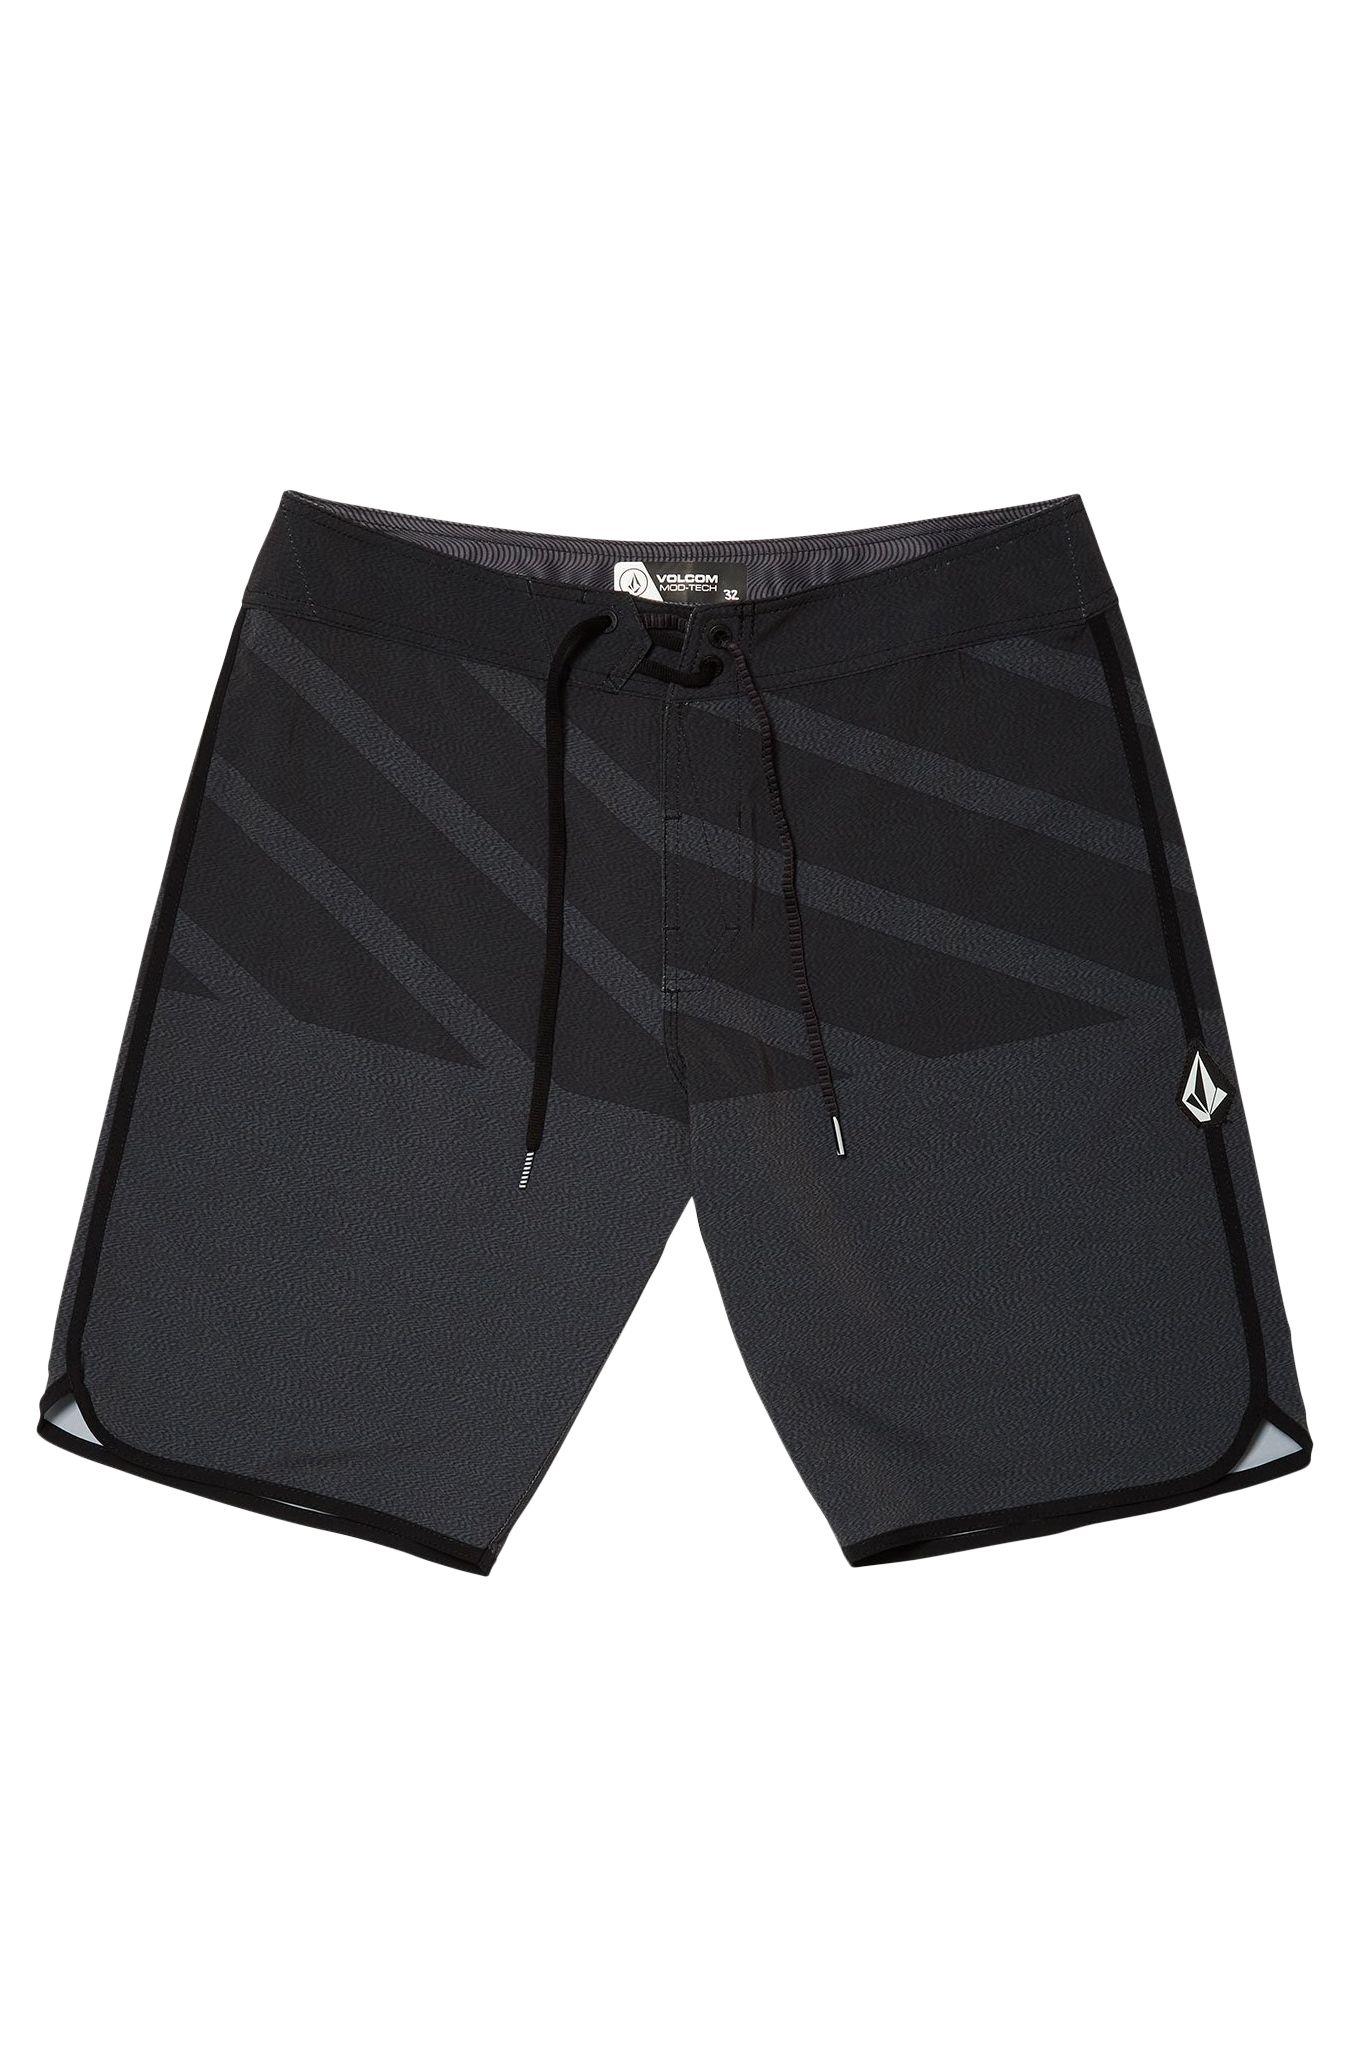 Volcom Boardshorts LIDO HEATHER MOD 20 Black